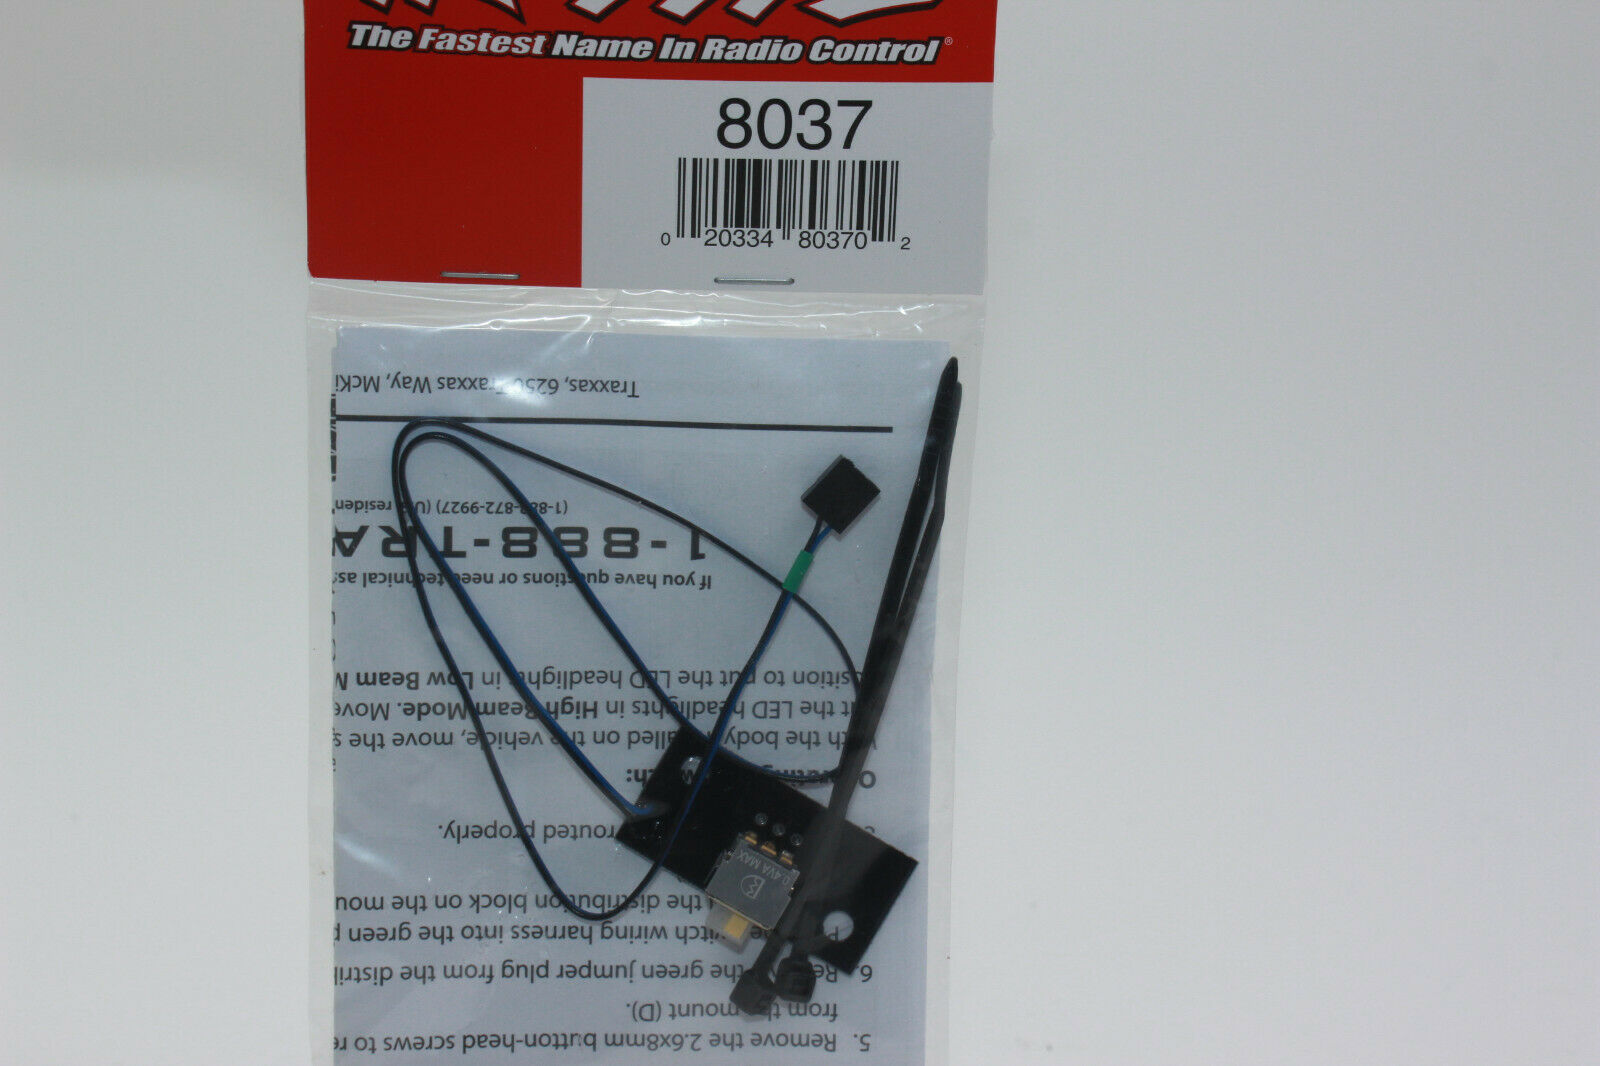 ... Traxxas LED Licht High Low Schalter für TRX8035 oder TRX8036 TRX8037 TRX-4